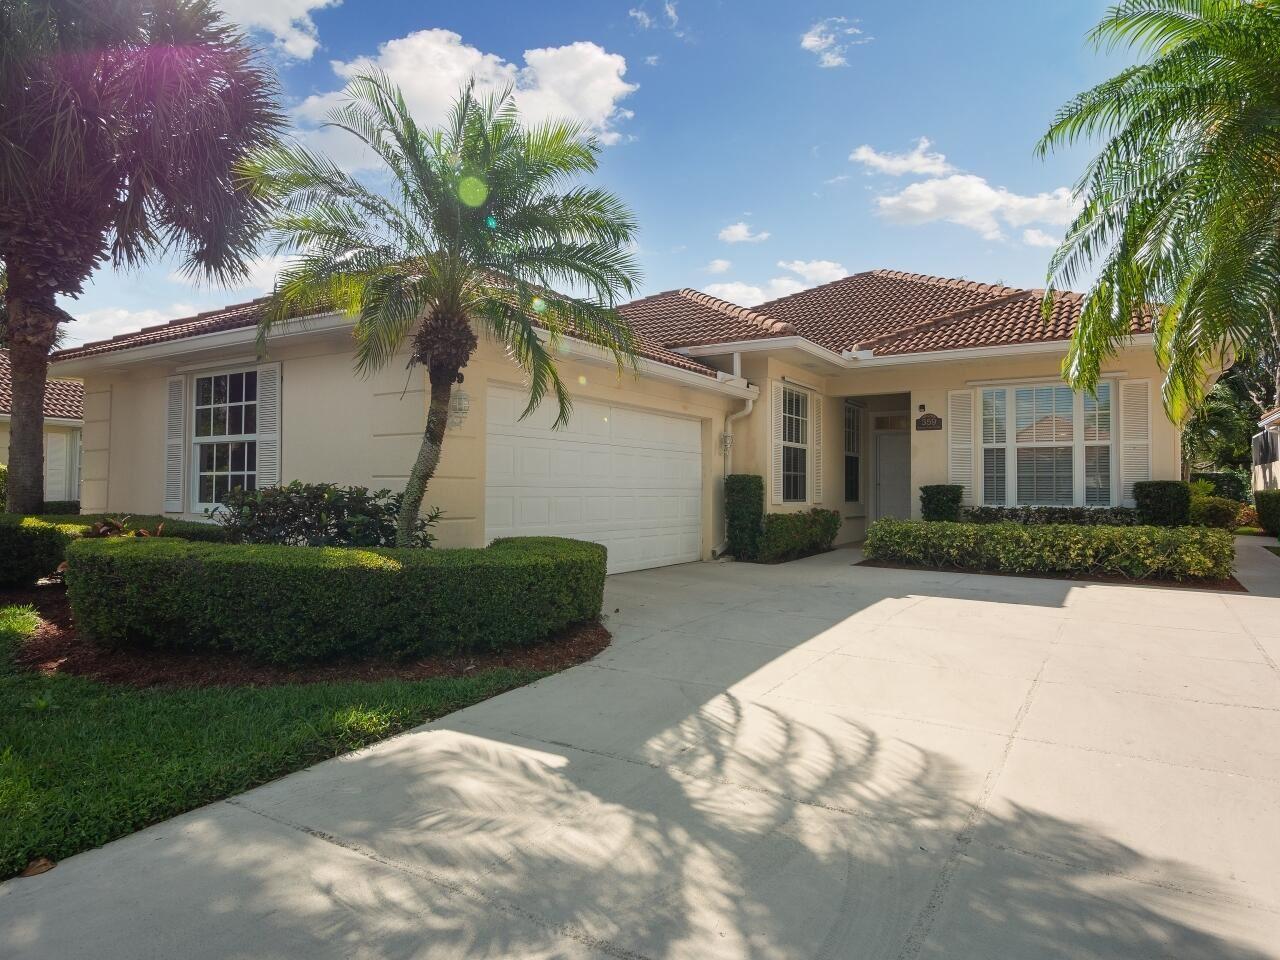 359 Kelsey Park Circle, Palm Beach Gardens, FL 33410 - MLS#: RX-10706404